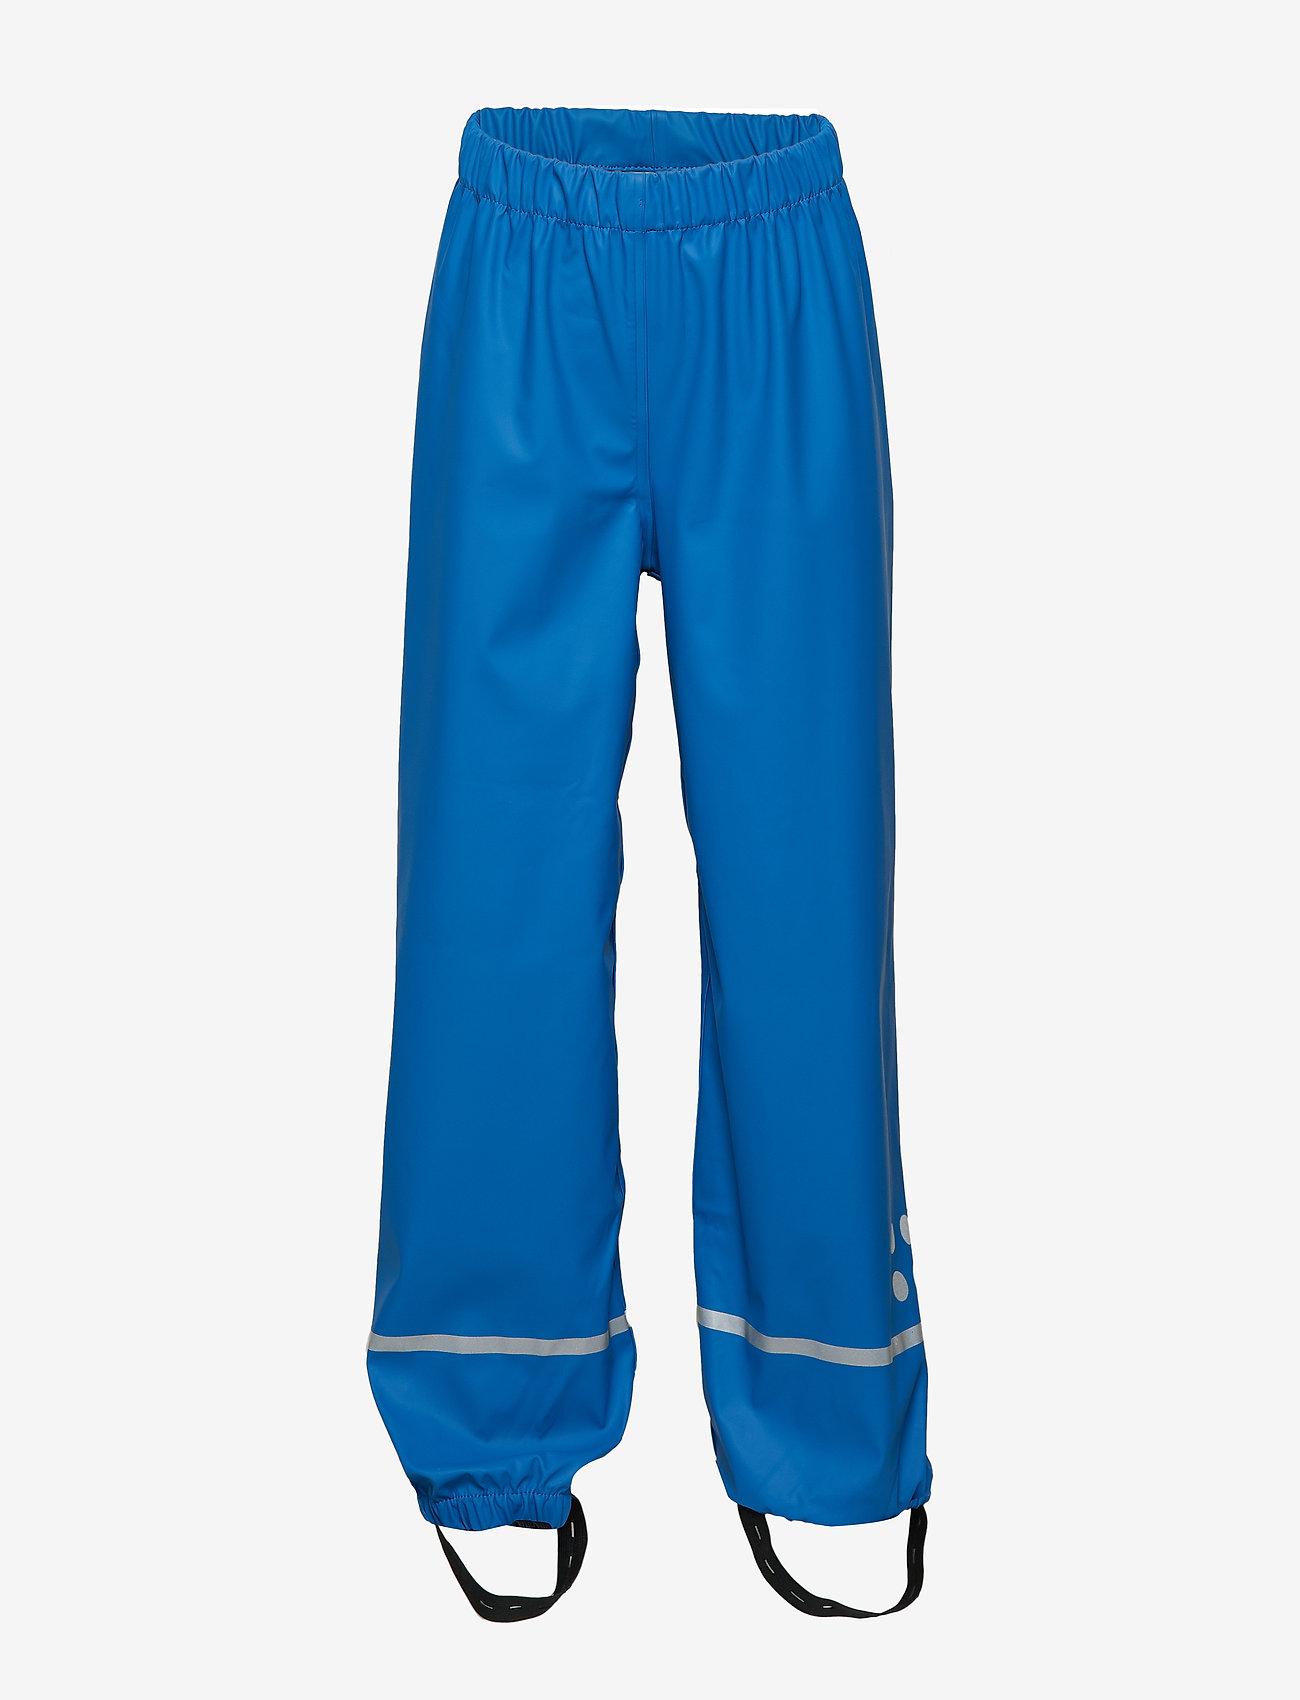 Lego wear - PUCK 101 - RAIN PANTS - pantalons - blue - 0